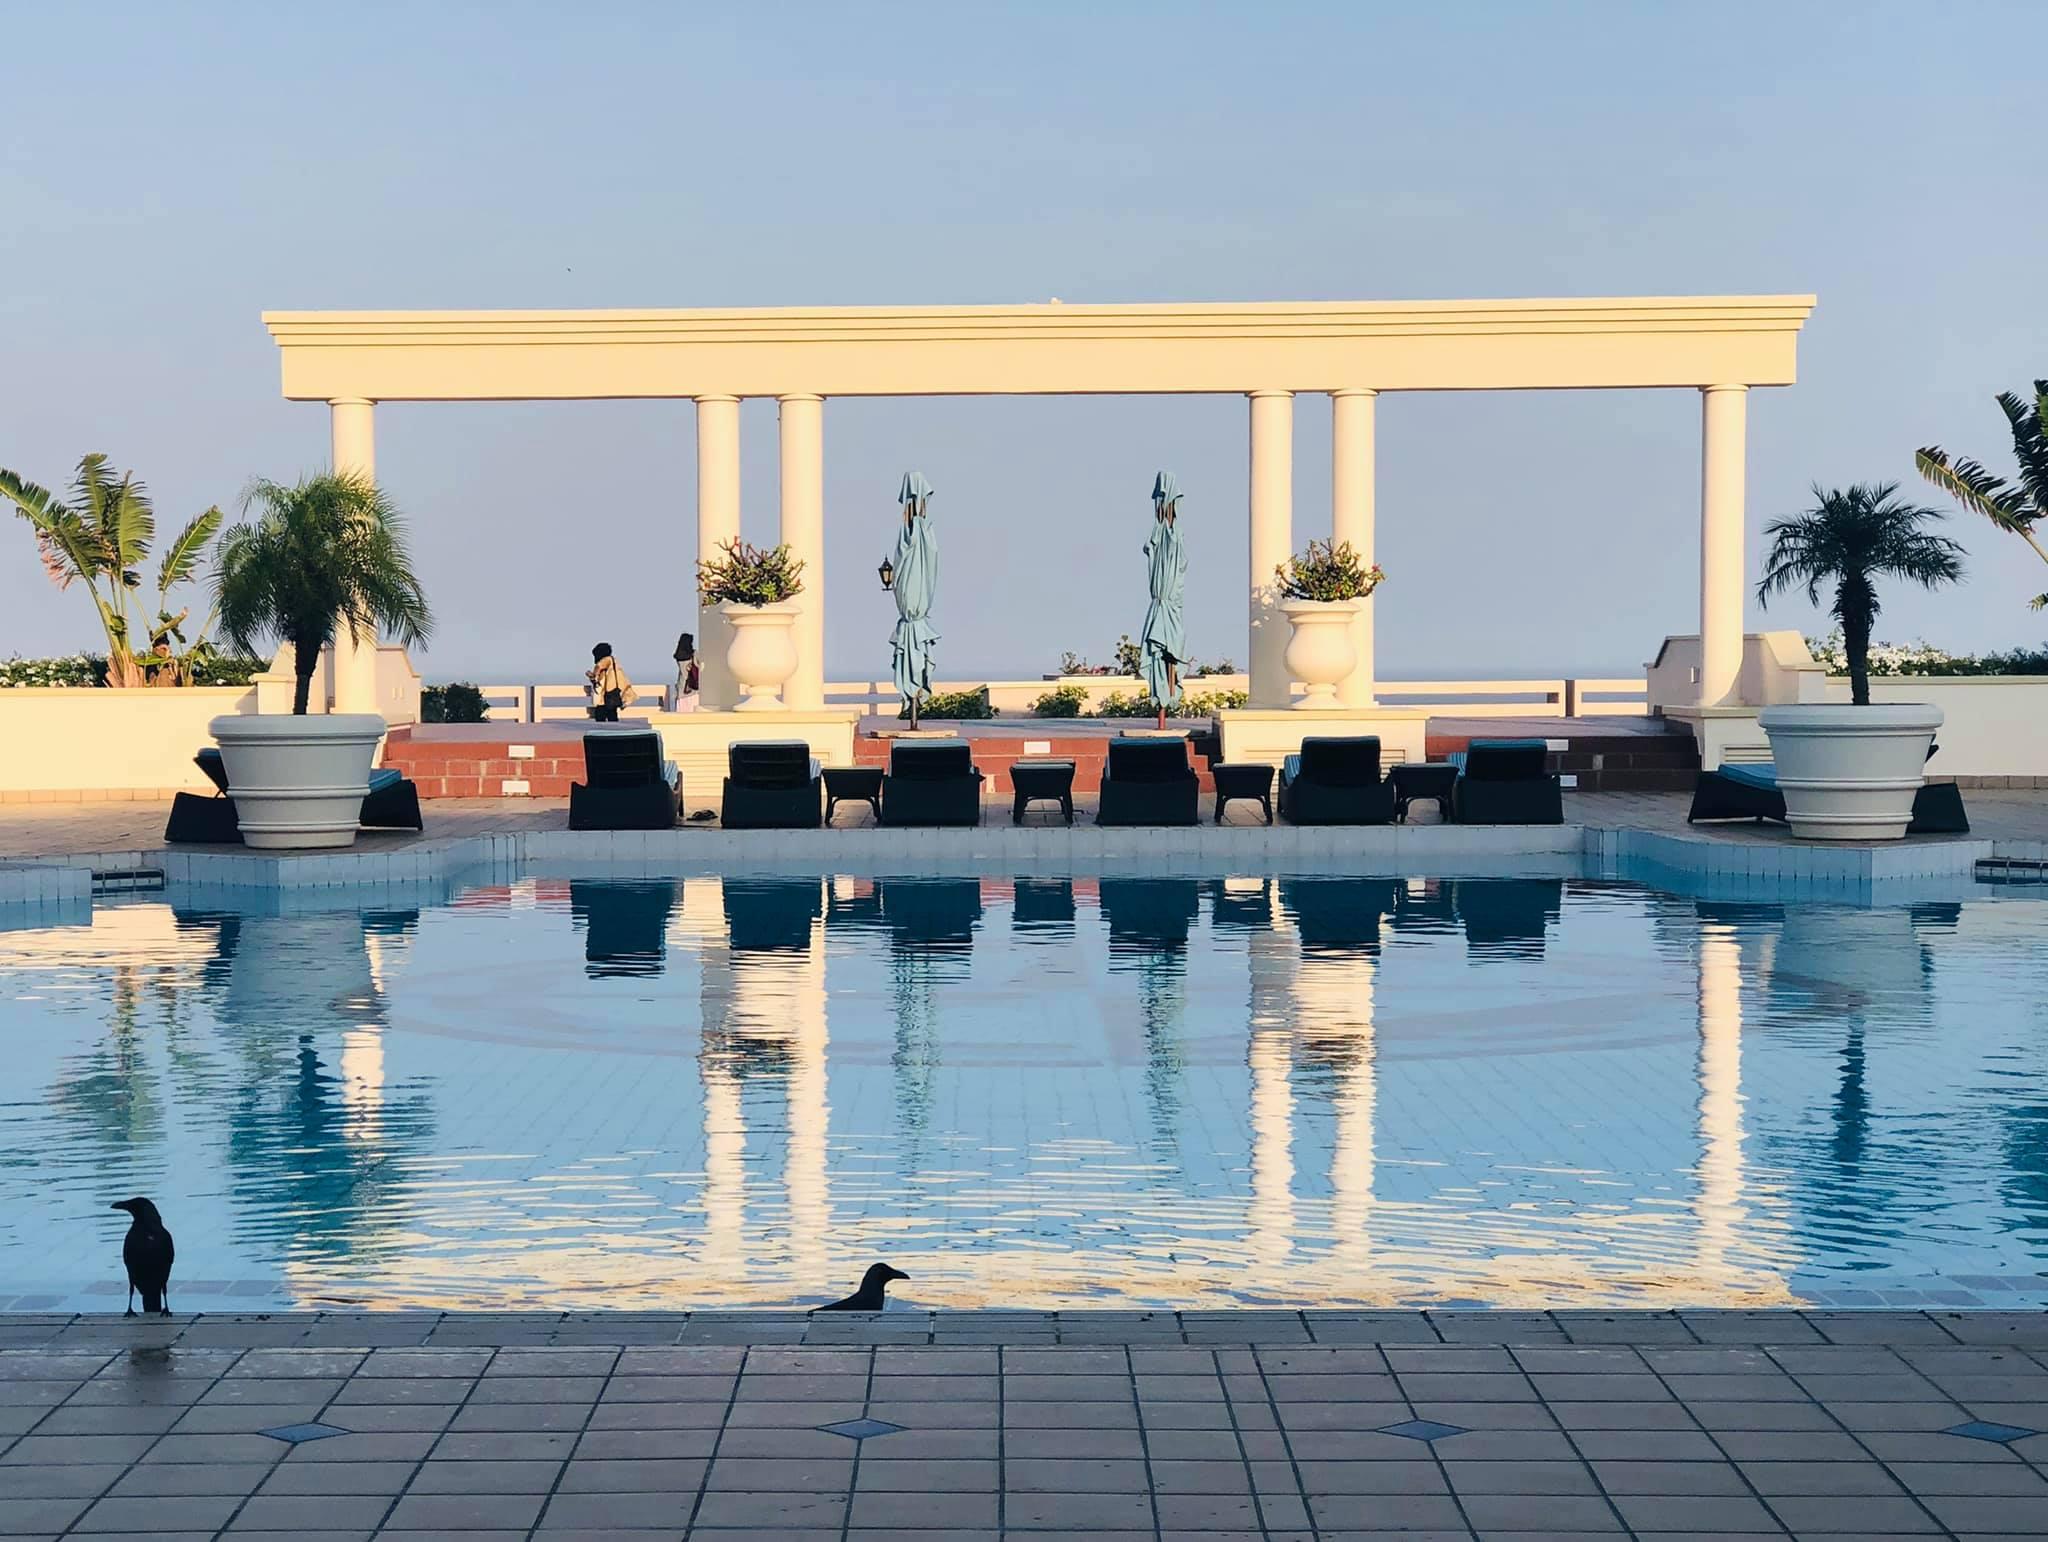 hotel polana Mozambique maputo bruce marais travel africa